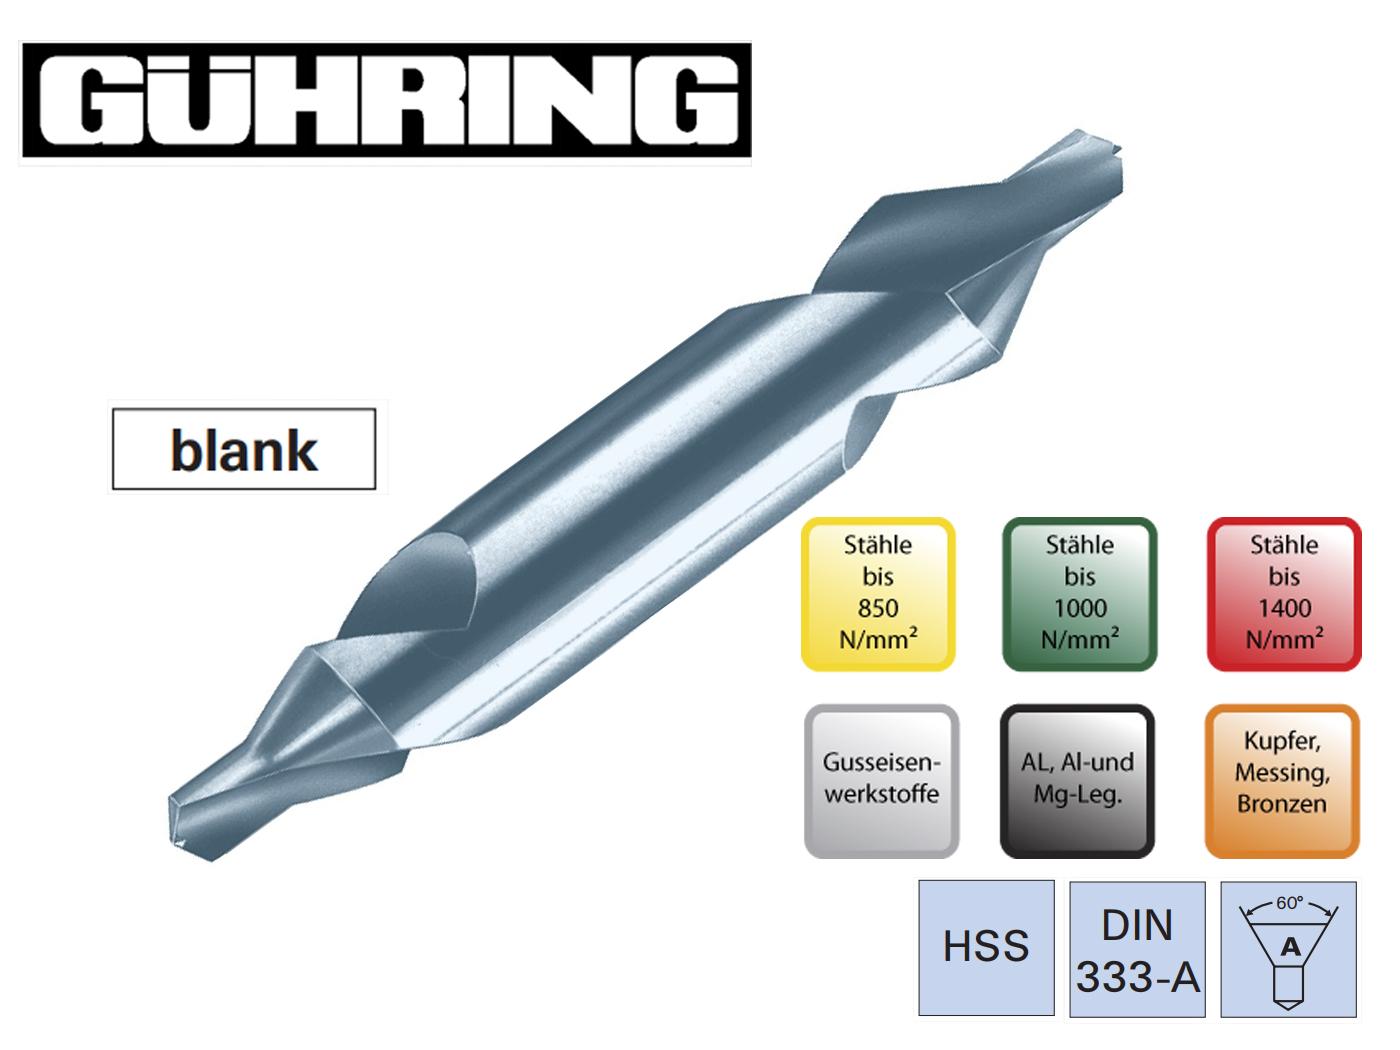 Centreerboren DIN 333 A HSS Guhring | DKMTools - DKM Tools